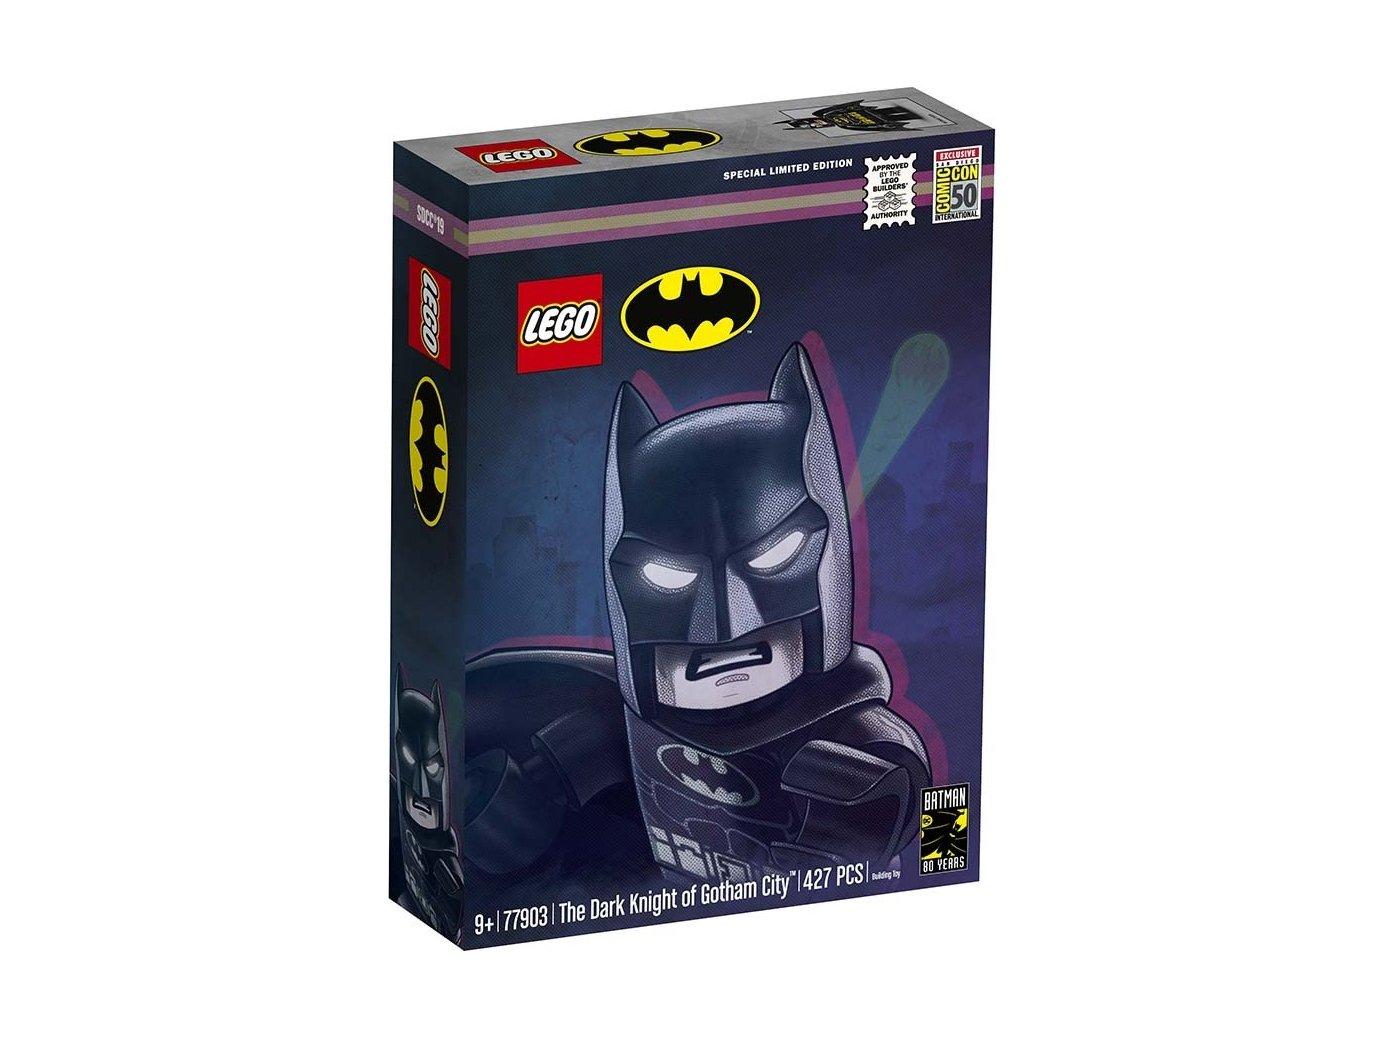 LEGO DC Comics™ Super Heroes 77903 The Dark Knight of Gotham City™